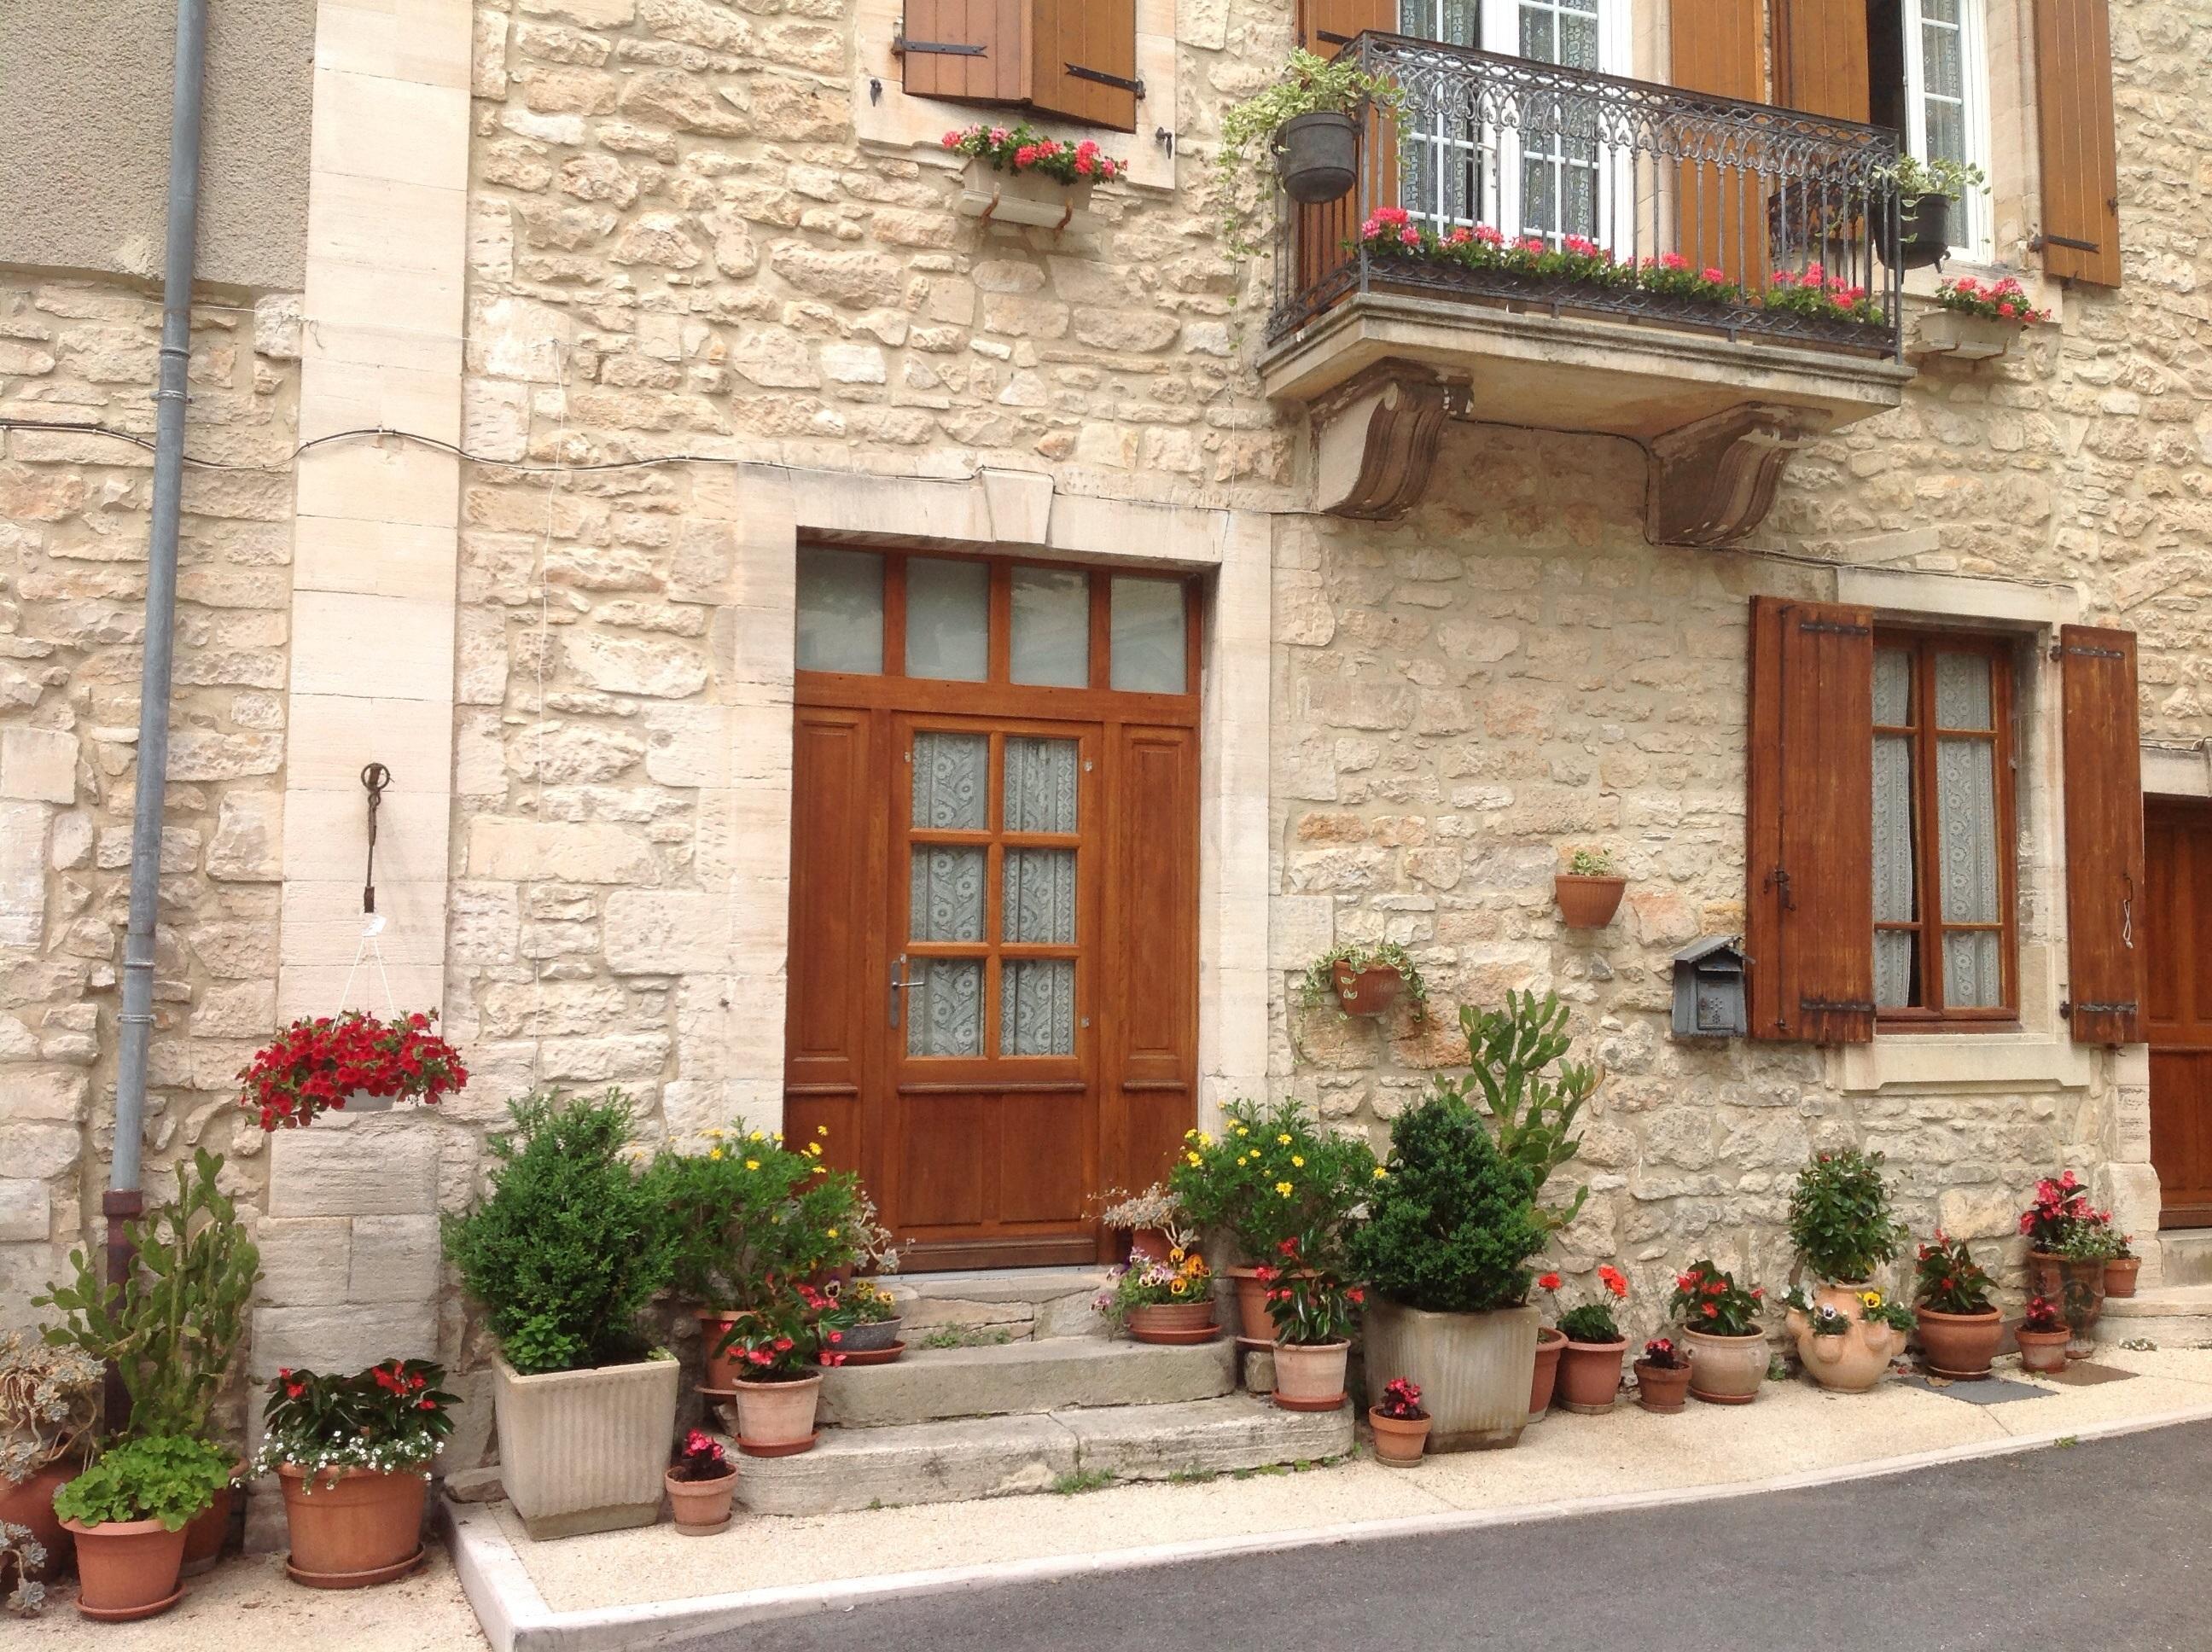 Banco de imagens janela constru o pedra varanda - Porche entrada vivienda ...